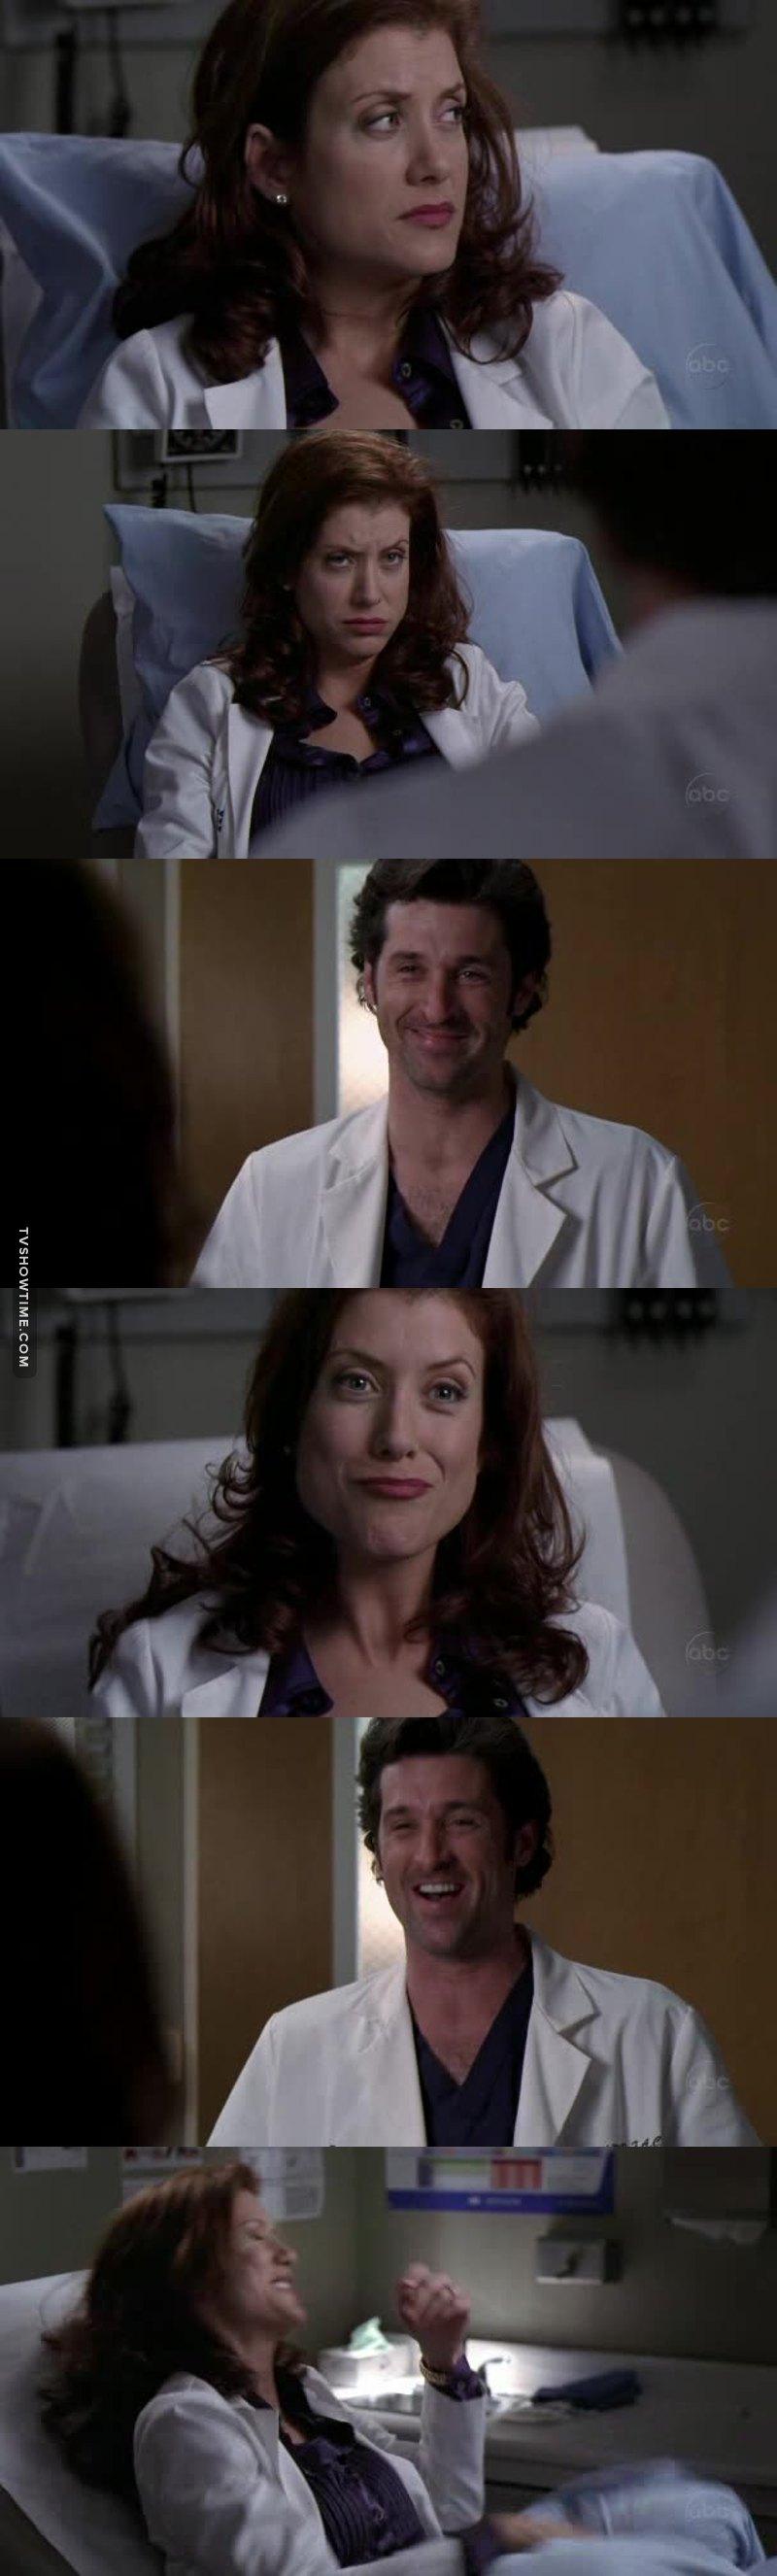 I love Addison so much 😂😂❤